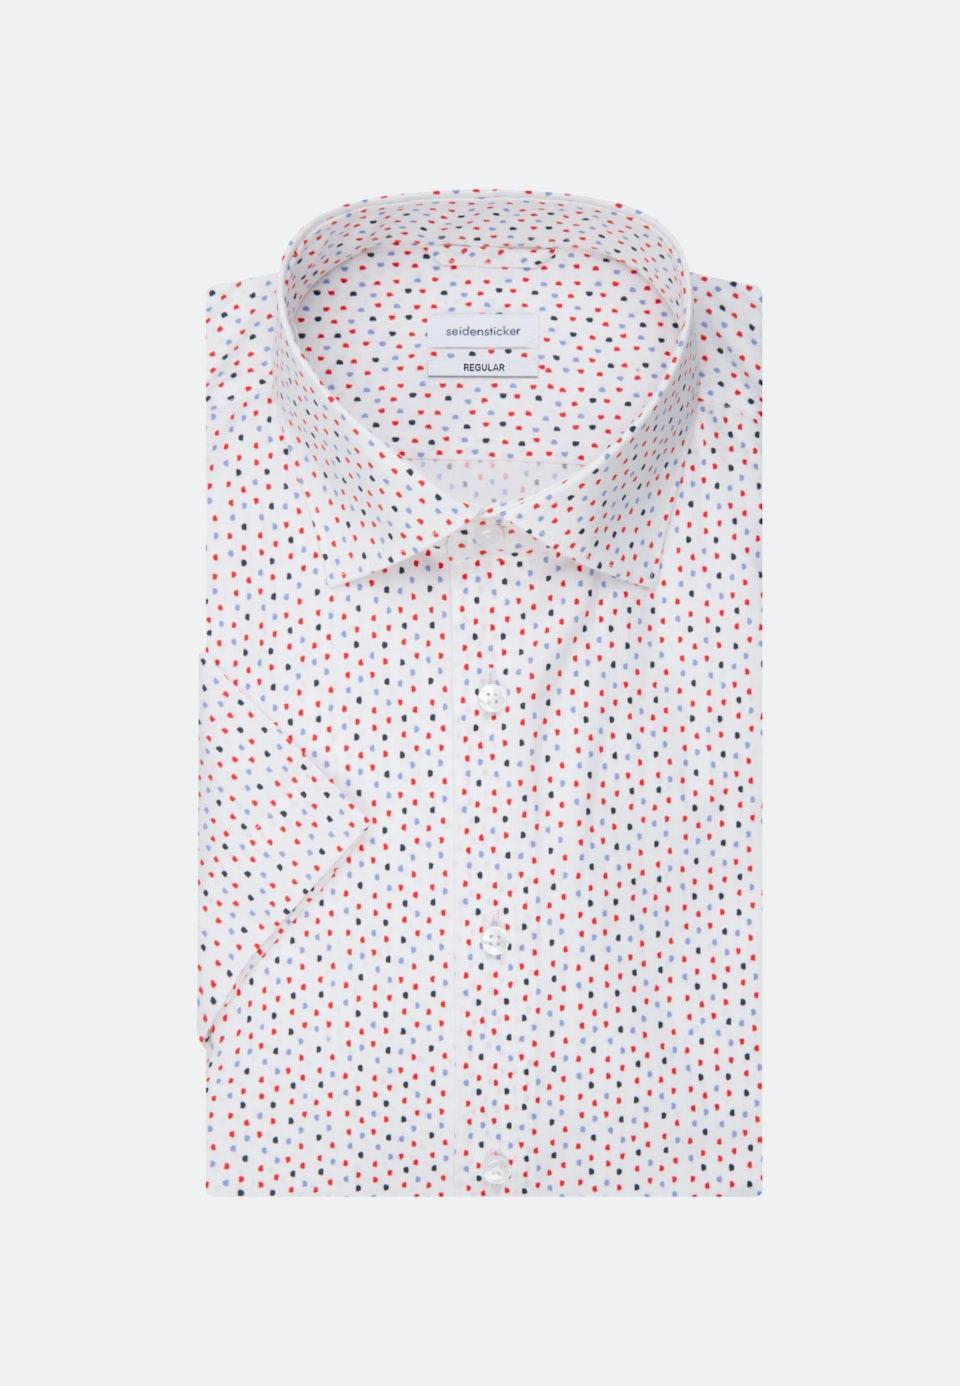 Popeline Kurzarm Business Hemd in Regular mit Kentkragen in Rot |  Seidensticker Onlineshop